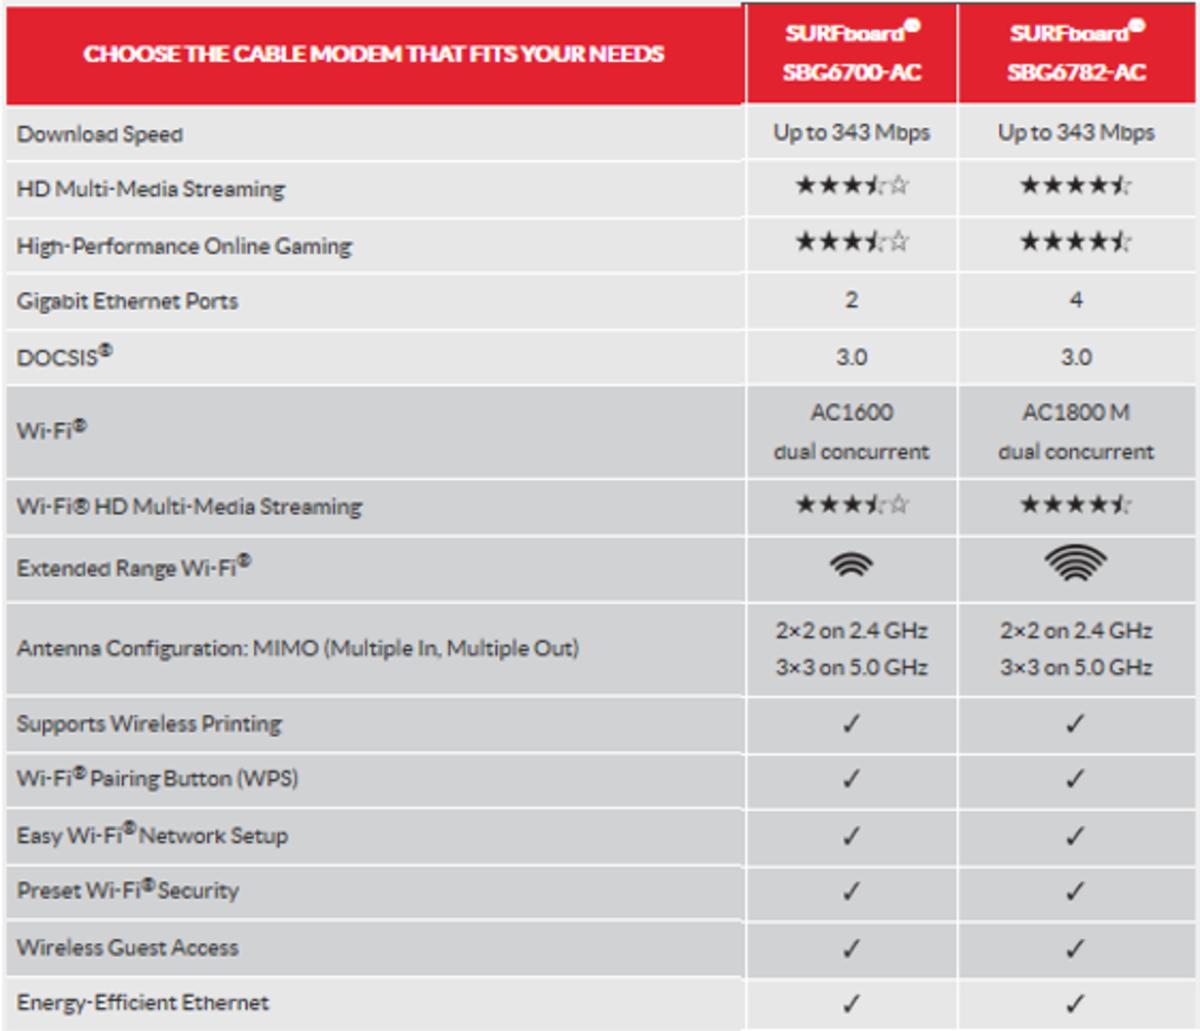 The similarities and differences between the Arris Motorola SBG6700-AC vs SBG6782-AC